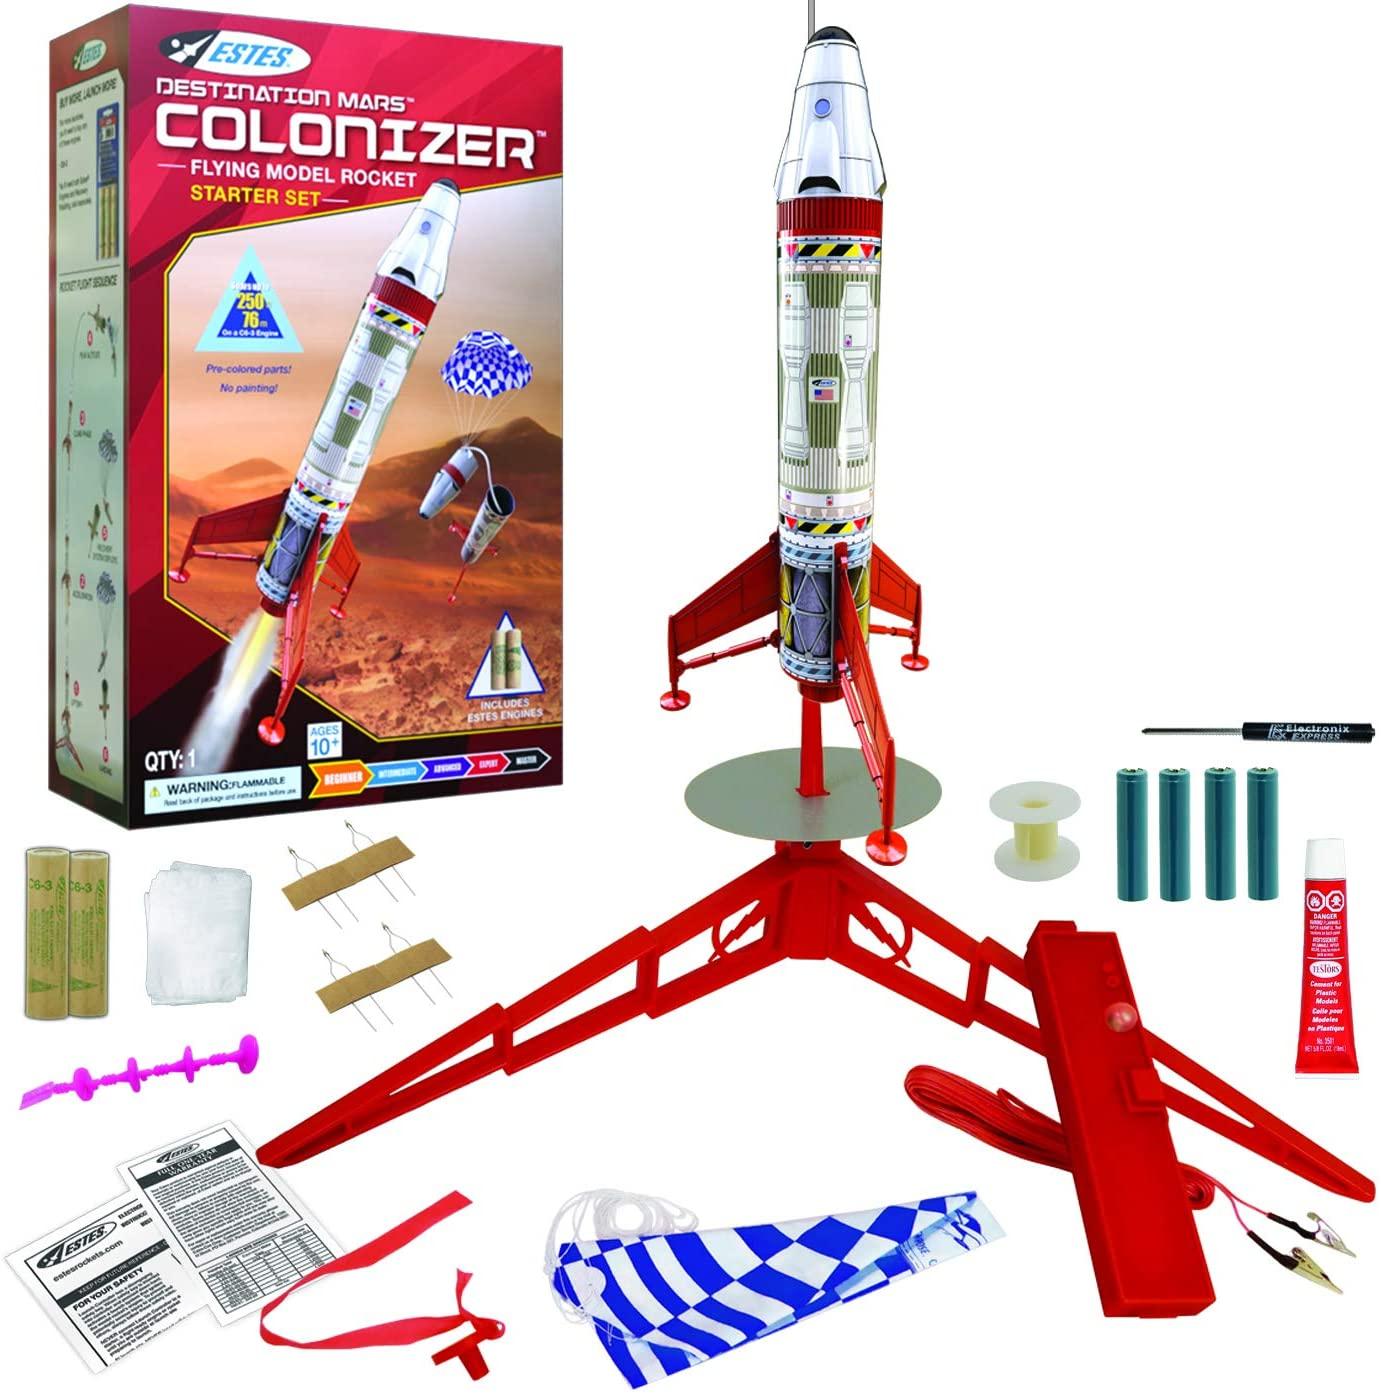 Estes Destination Mars Colonizer Model Rocket Starter Set - Includes Rocket Kit (Beginner Skill Level)